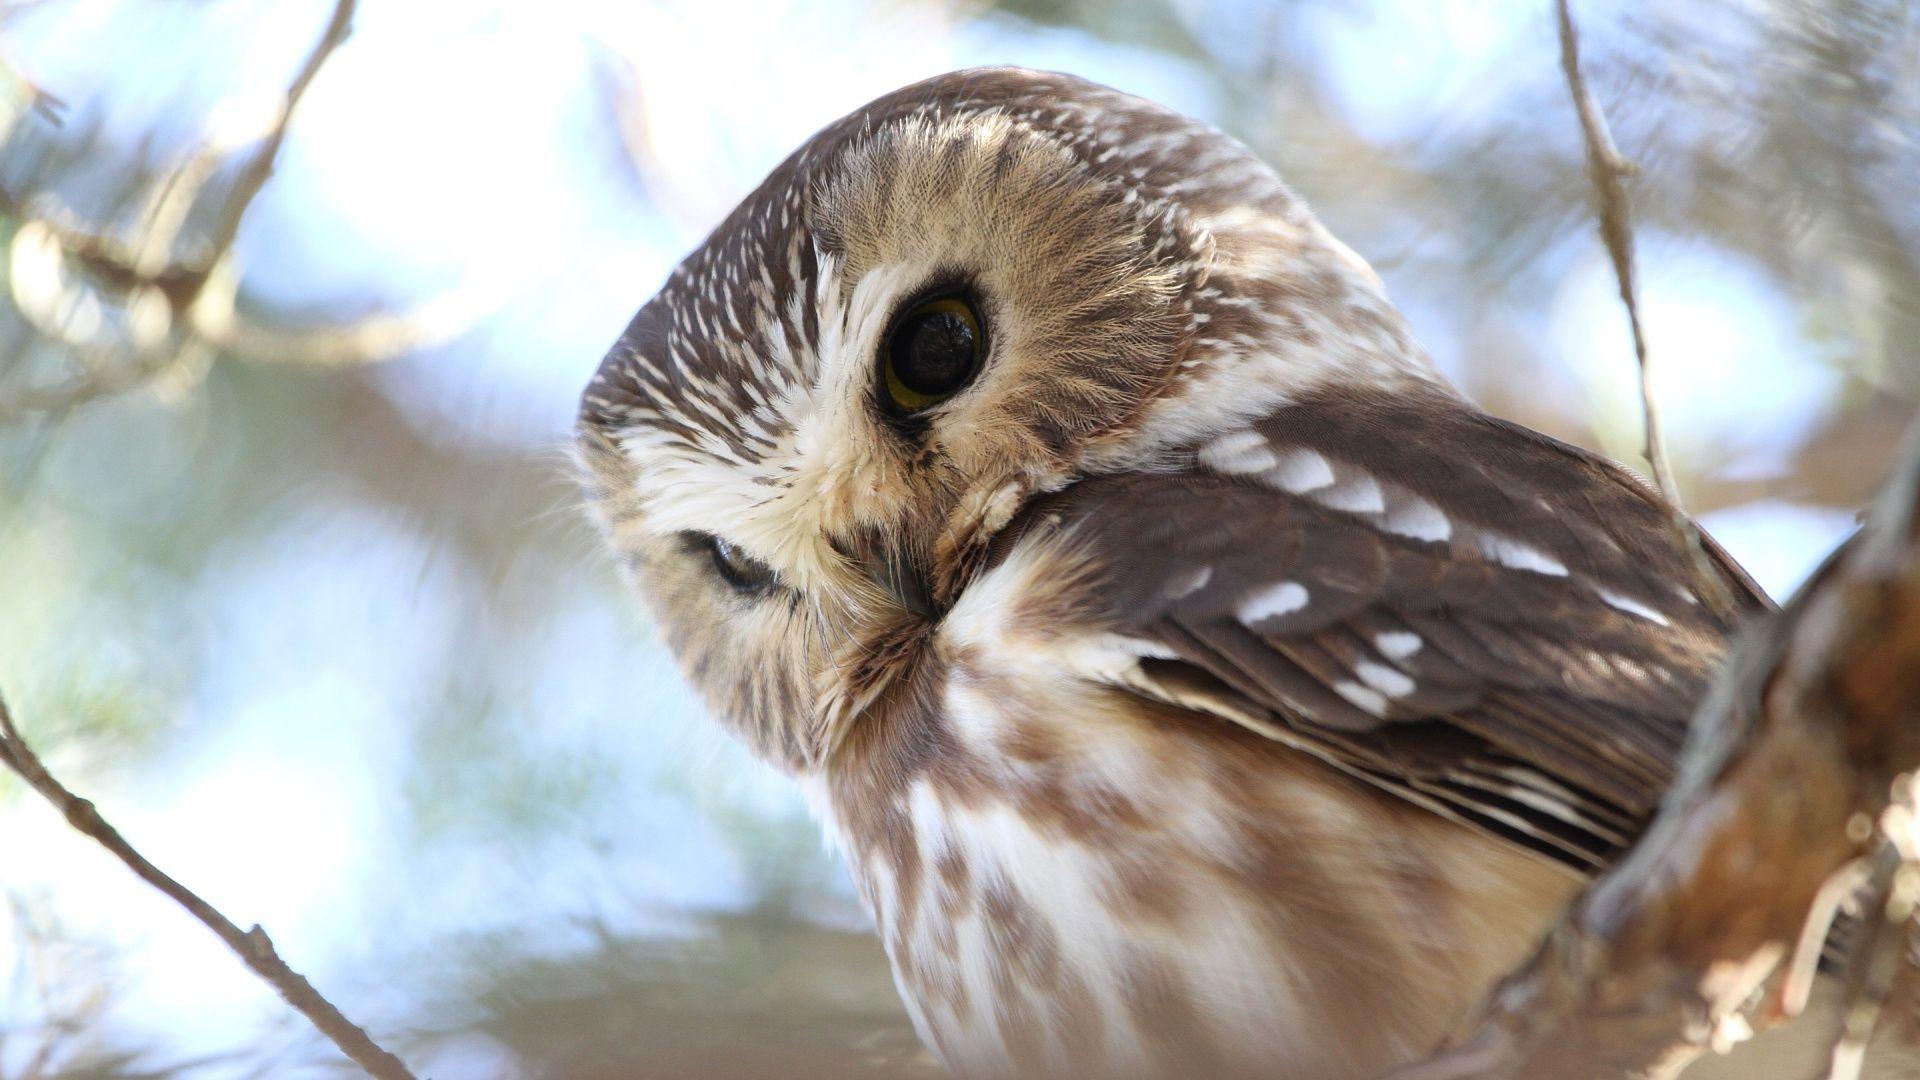 owl city iphone wallpaper